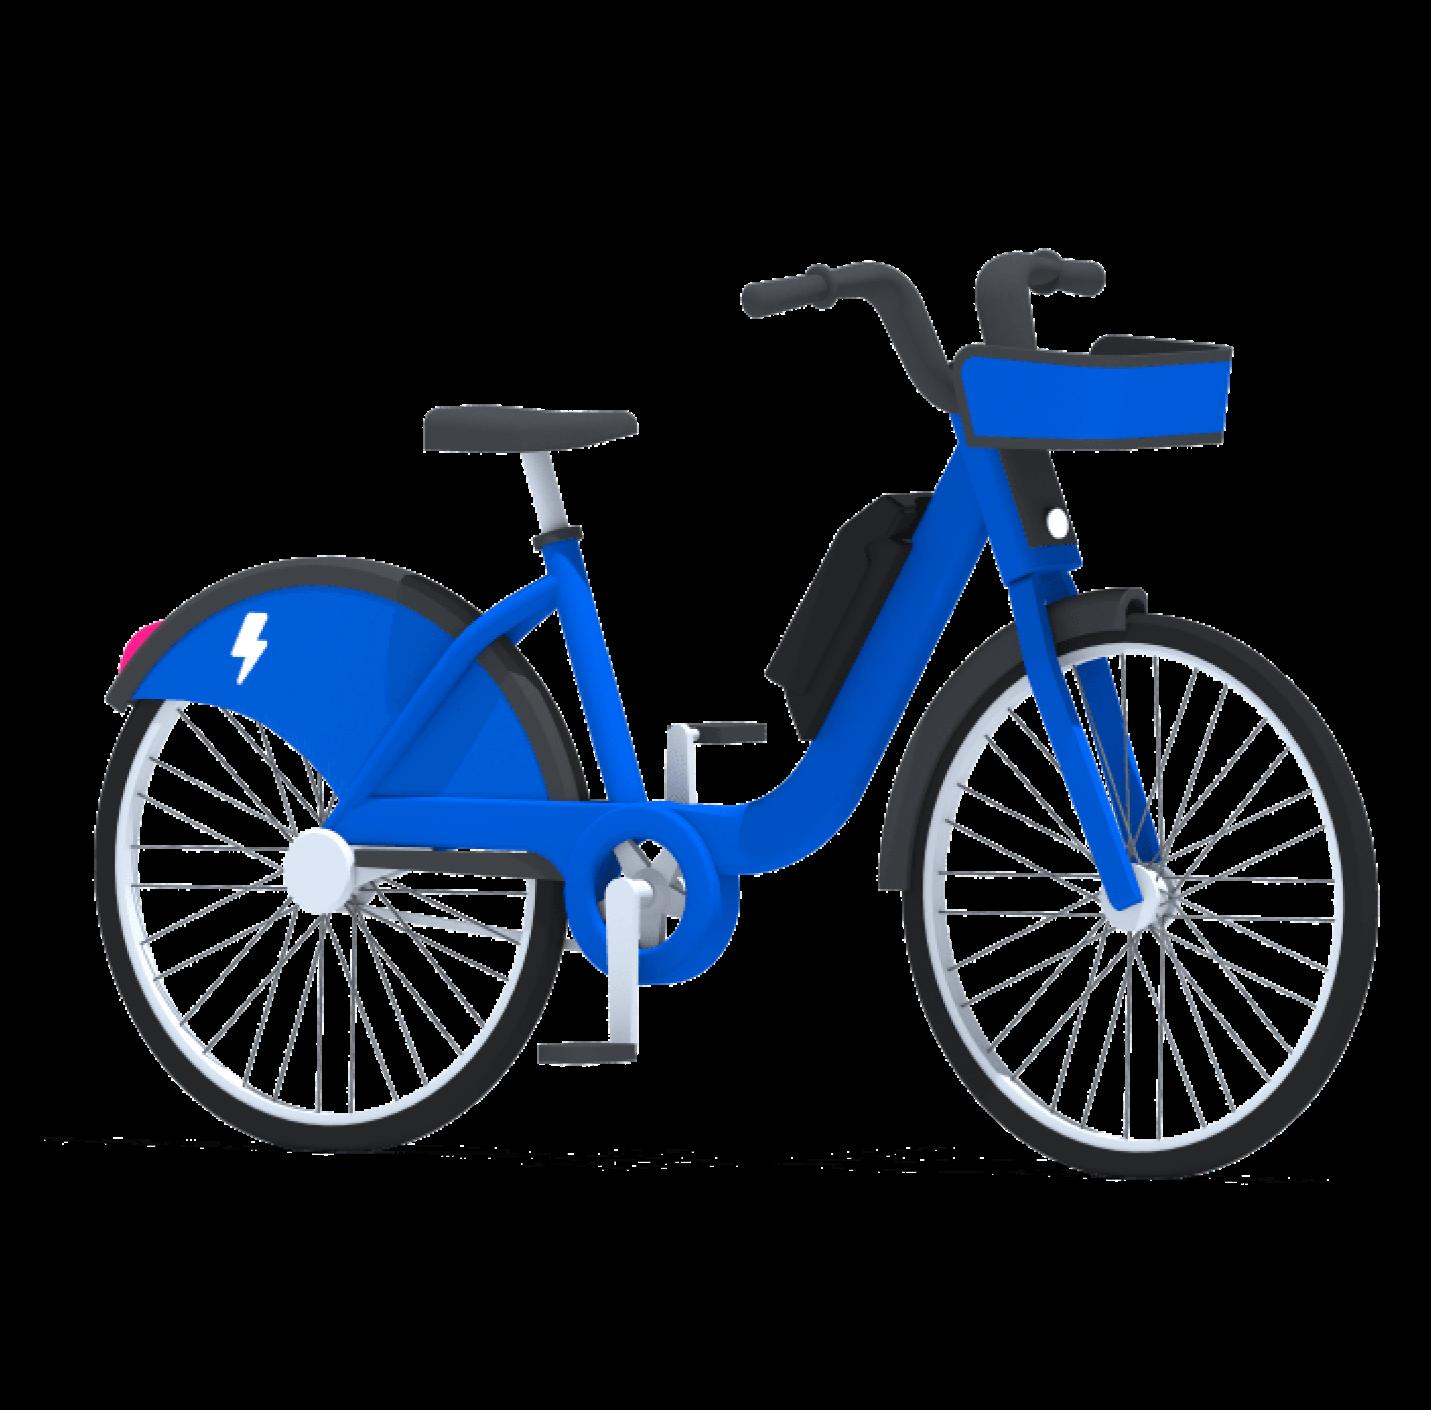 CitiBike electric bike image